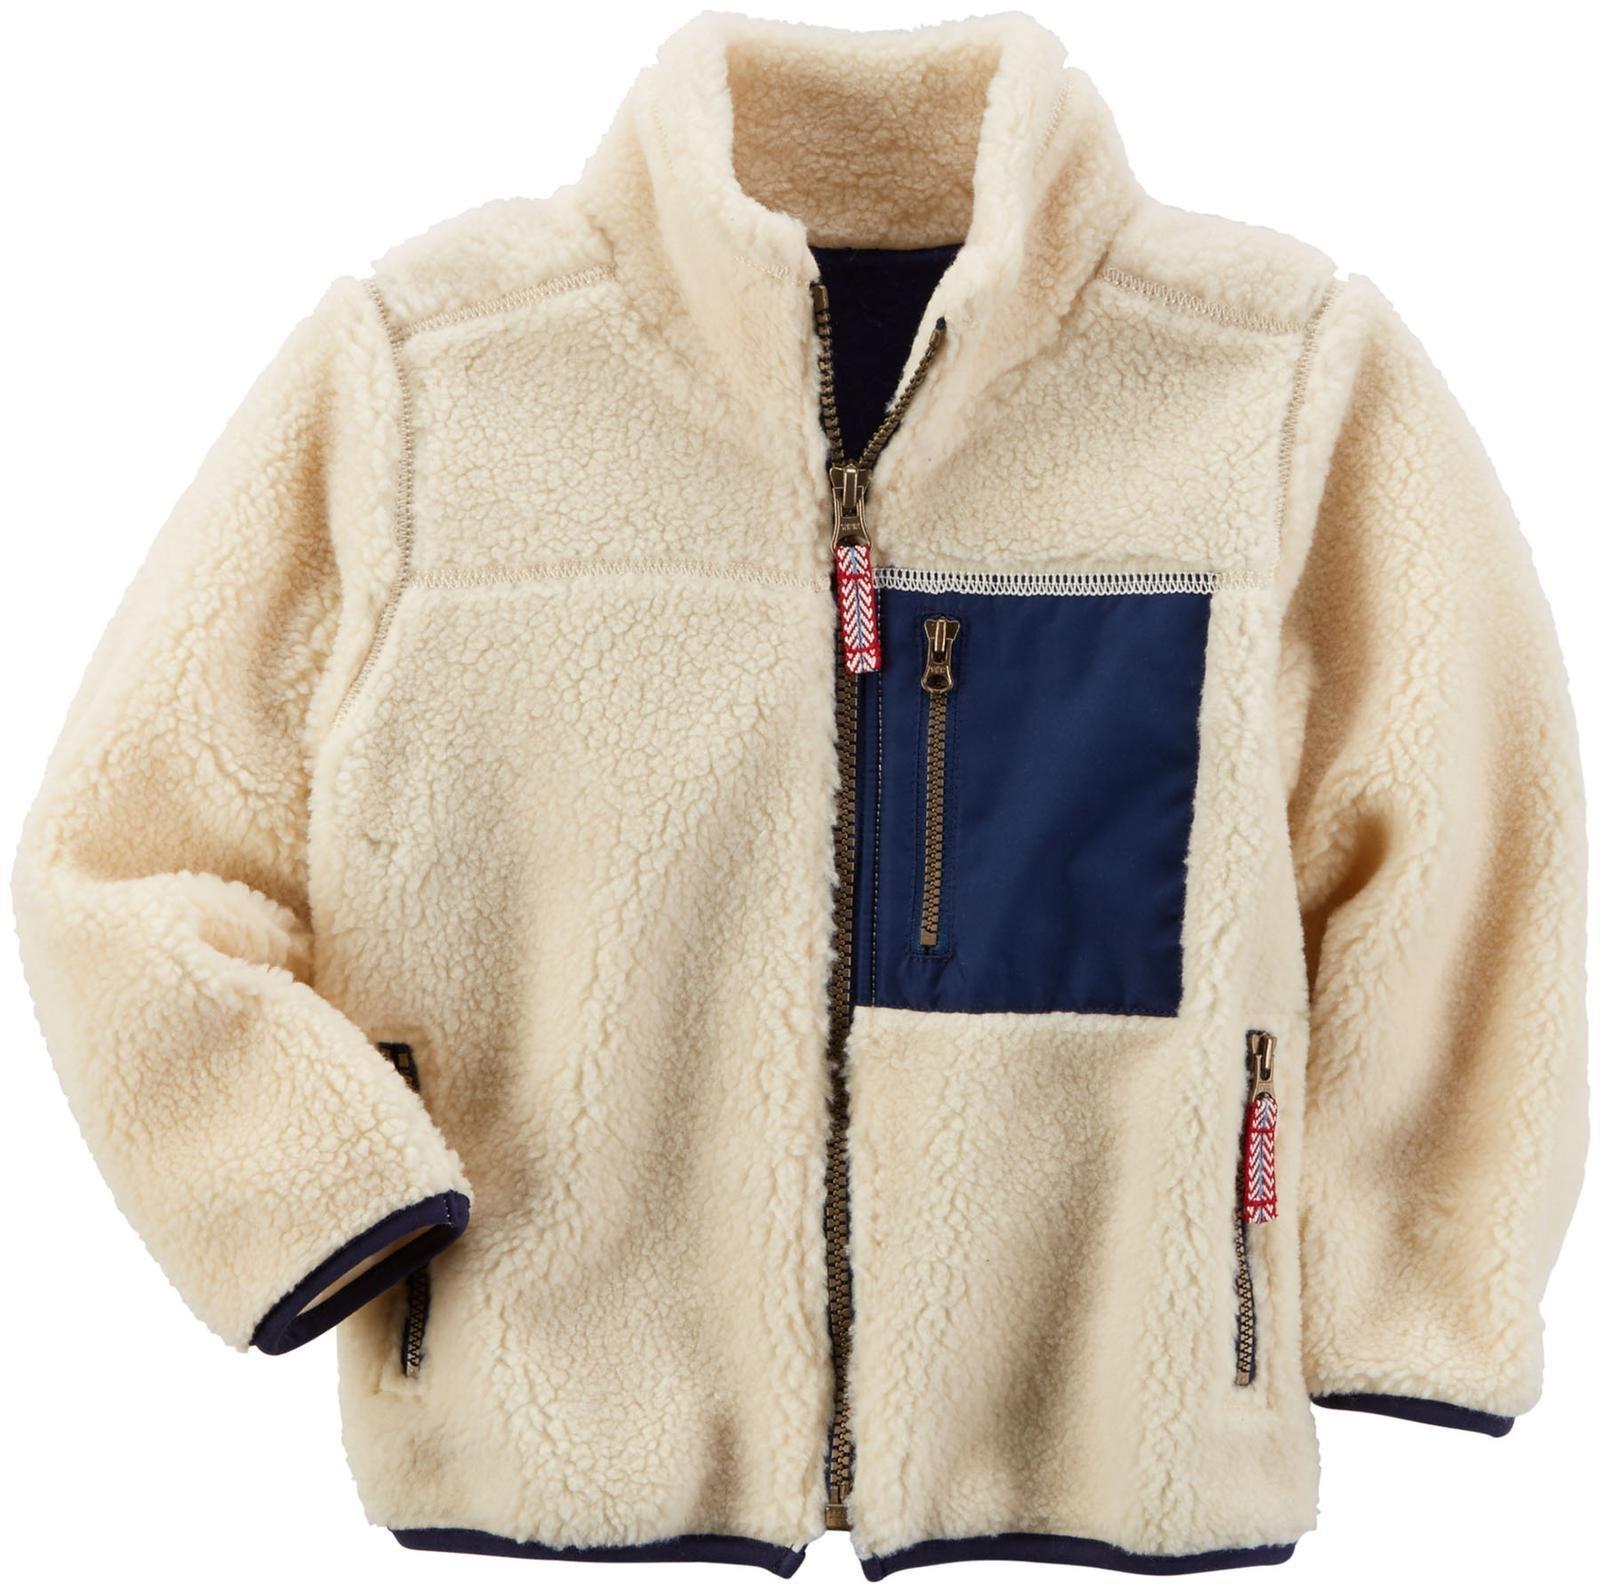 Carter's Boys' Knit Layering 263g577, White, 8